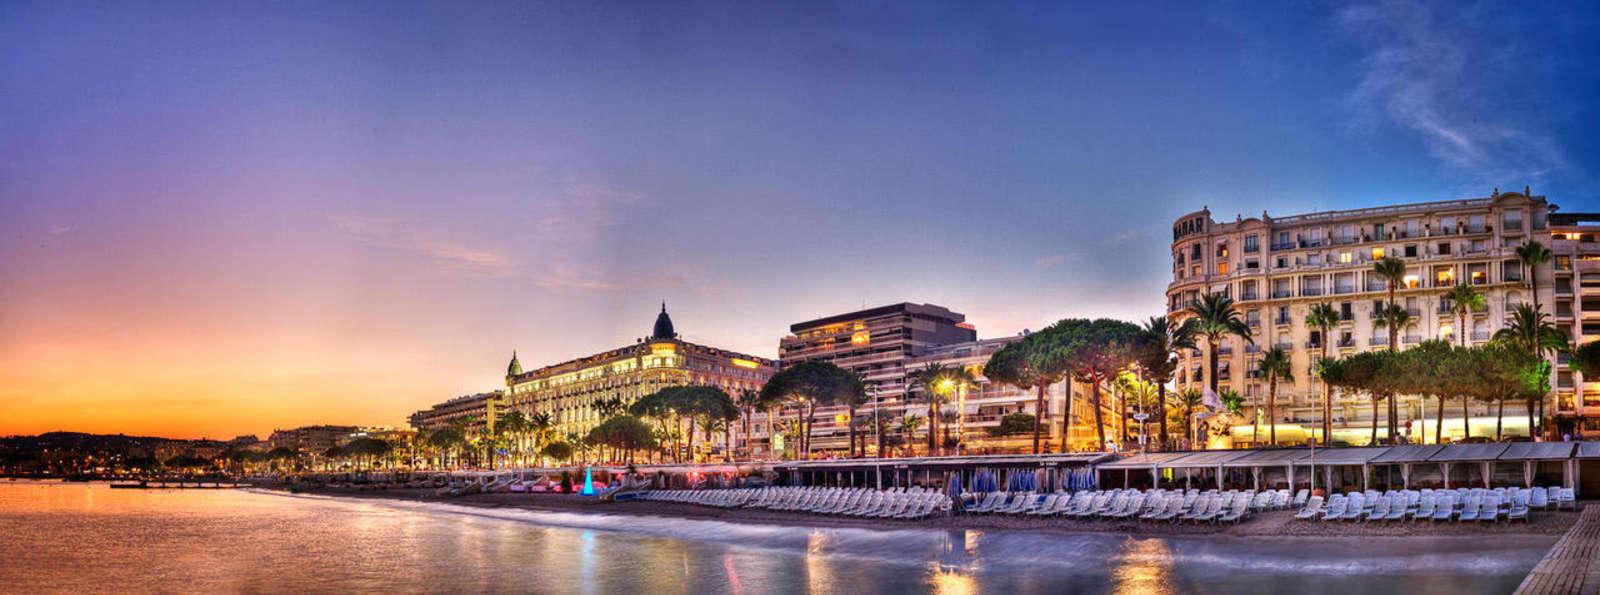 Hotel Croisette Beach Cannes MGallery By Sofitel - Vue_de_la_Croisette_2.jpg